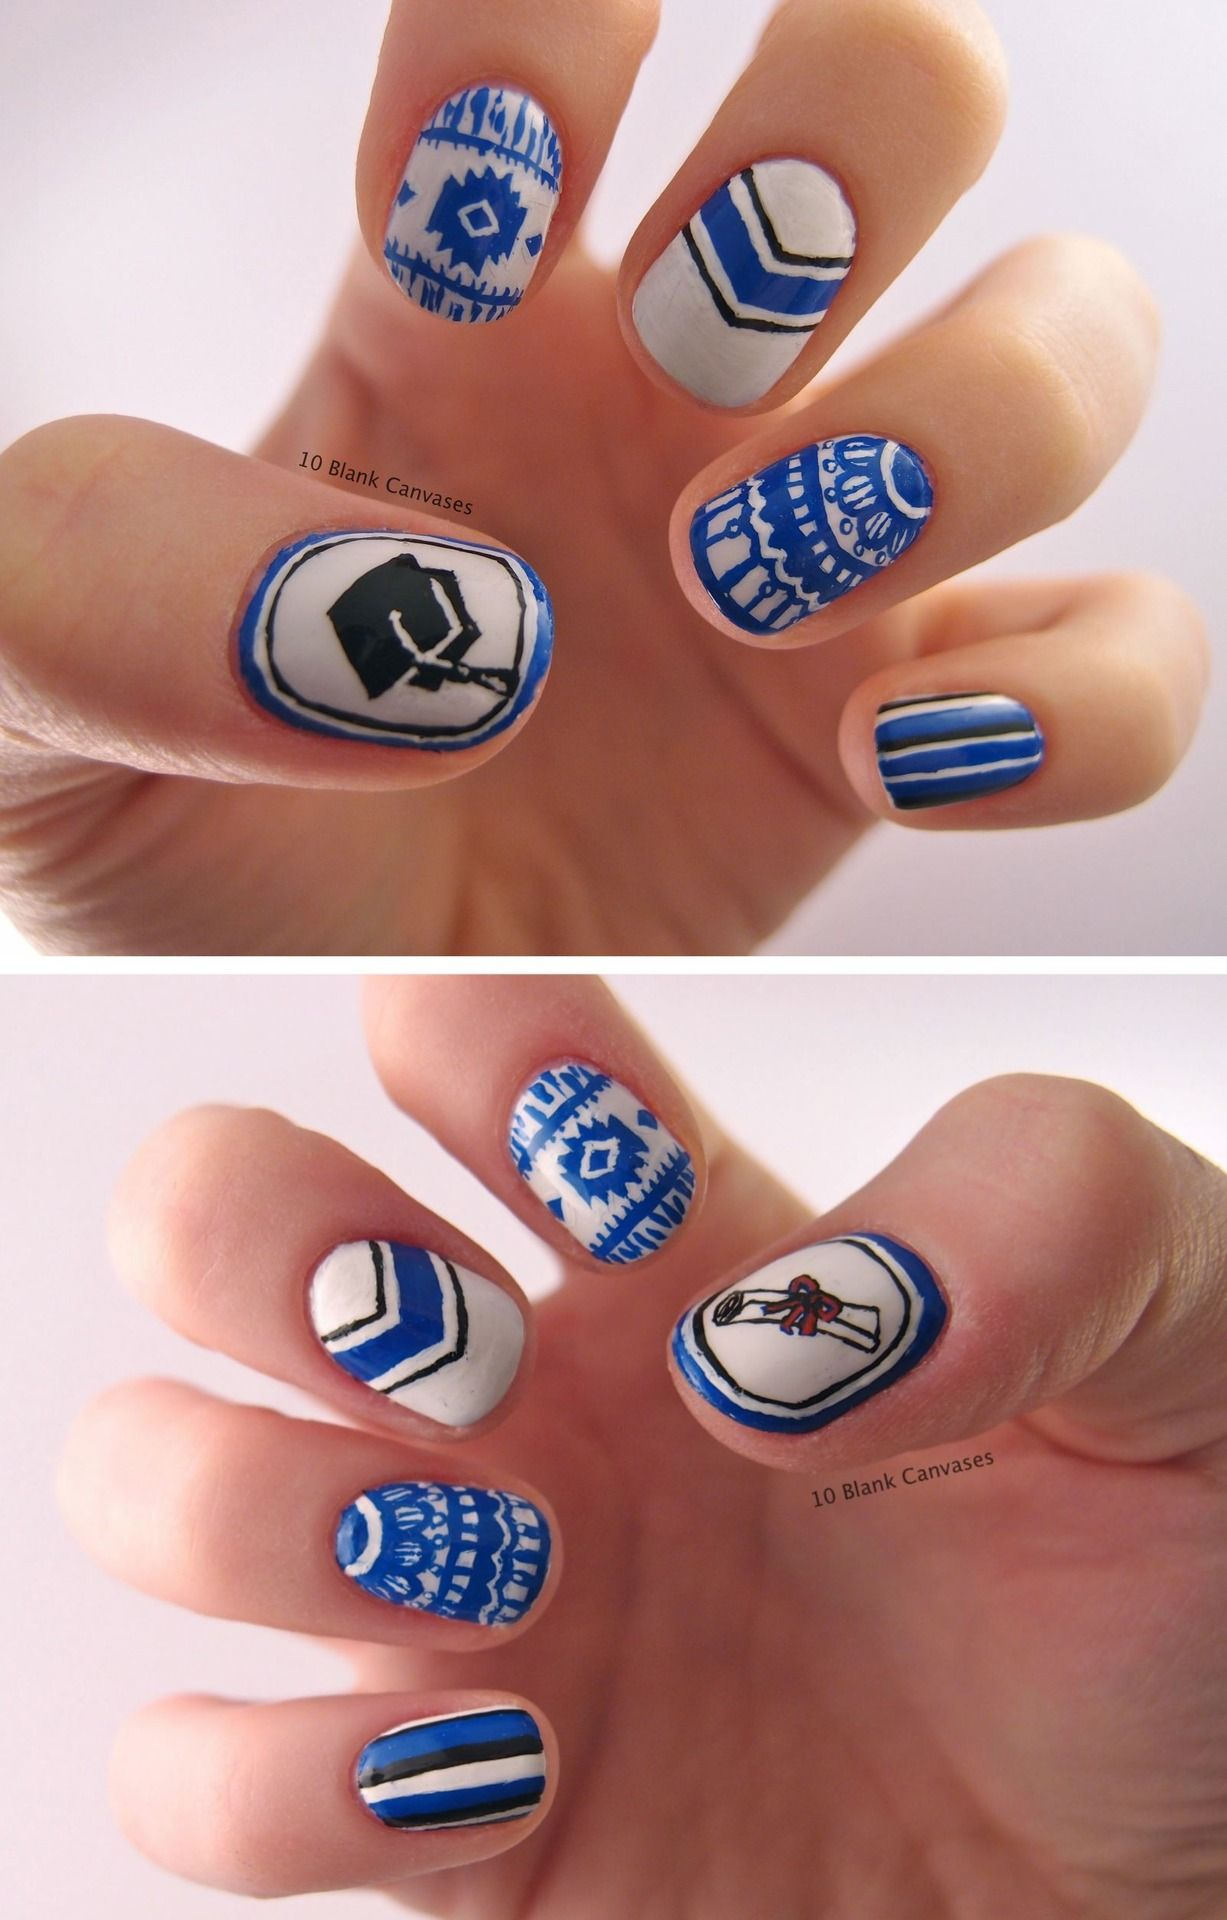 10blankcanvases:  Graduation nails